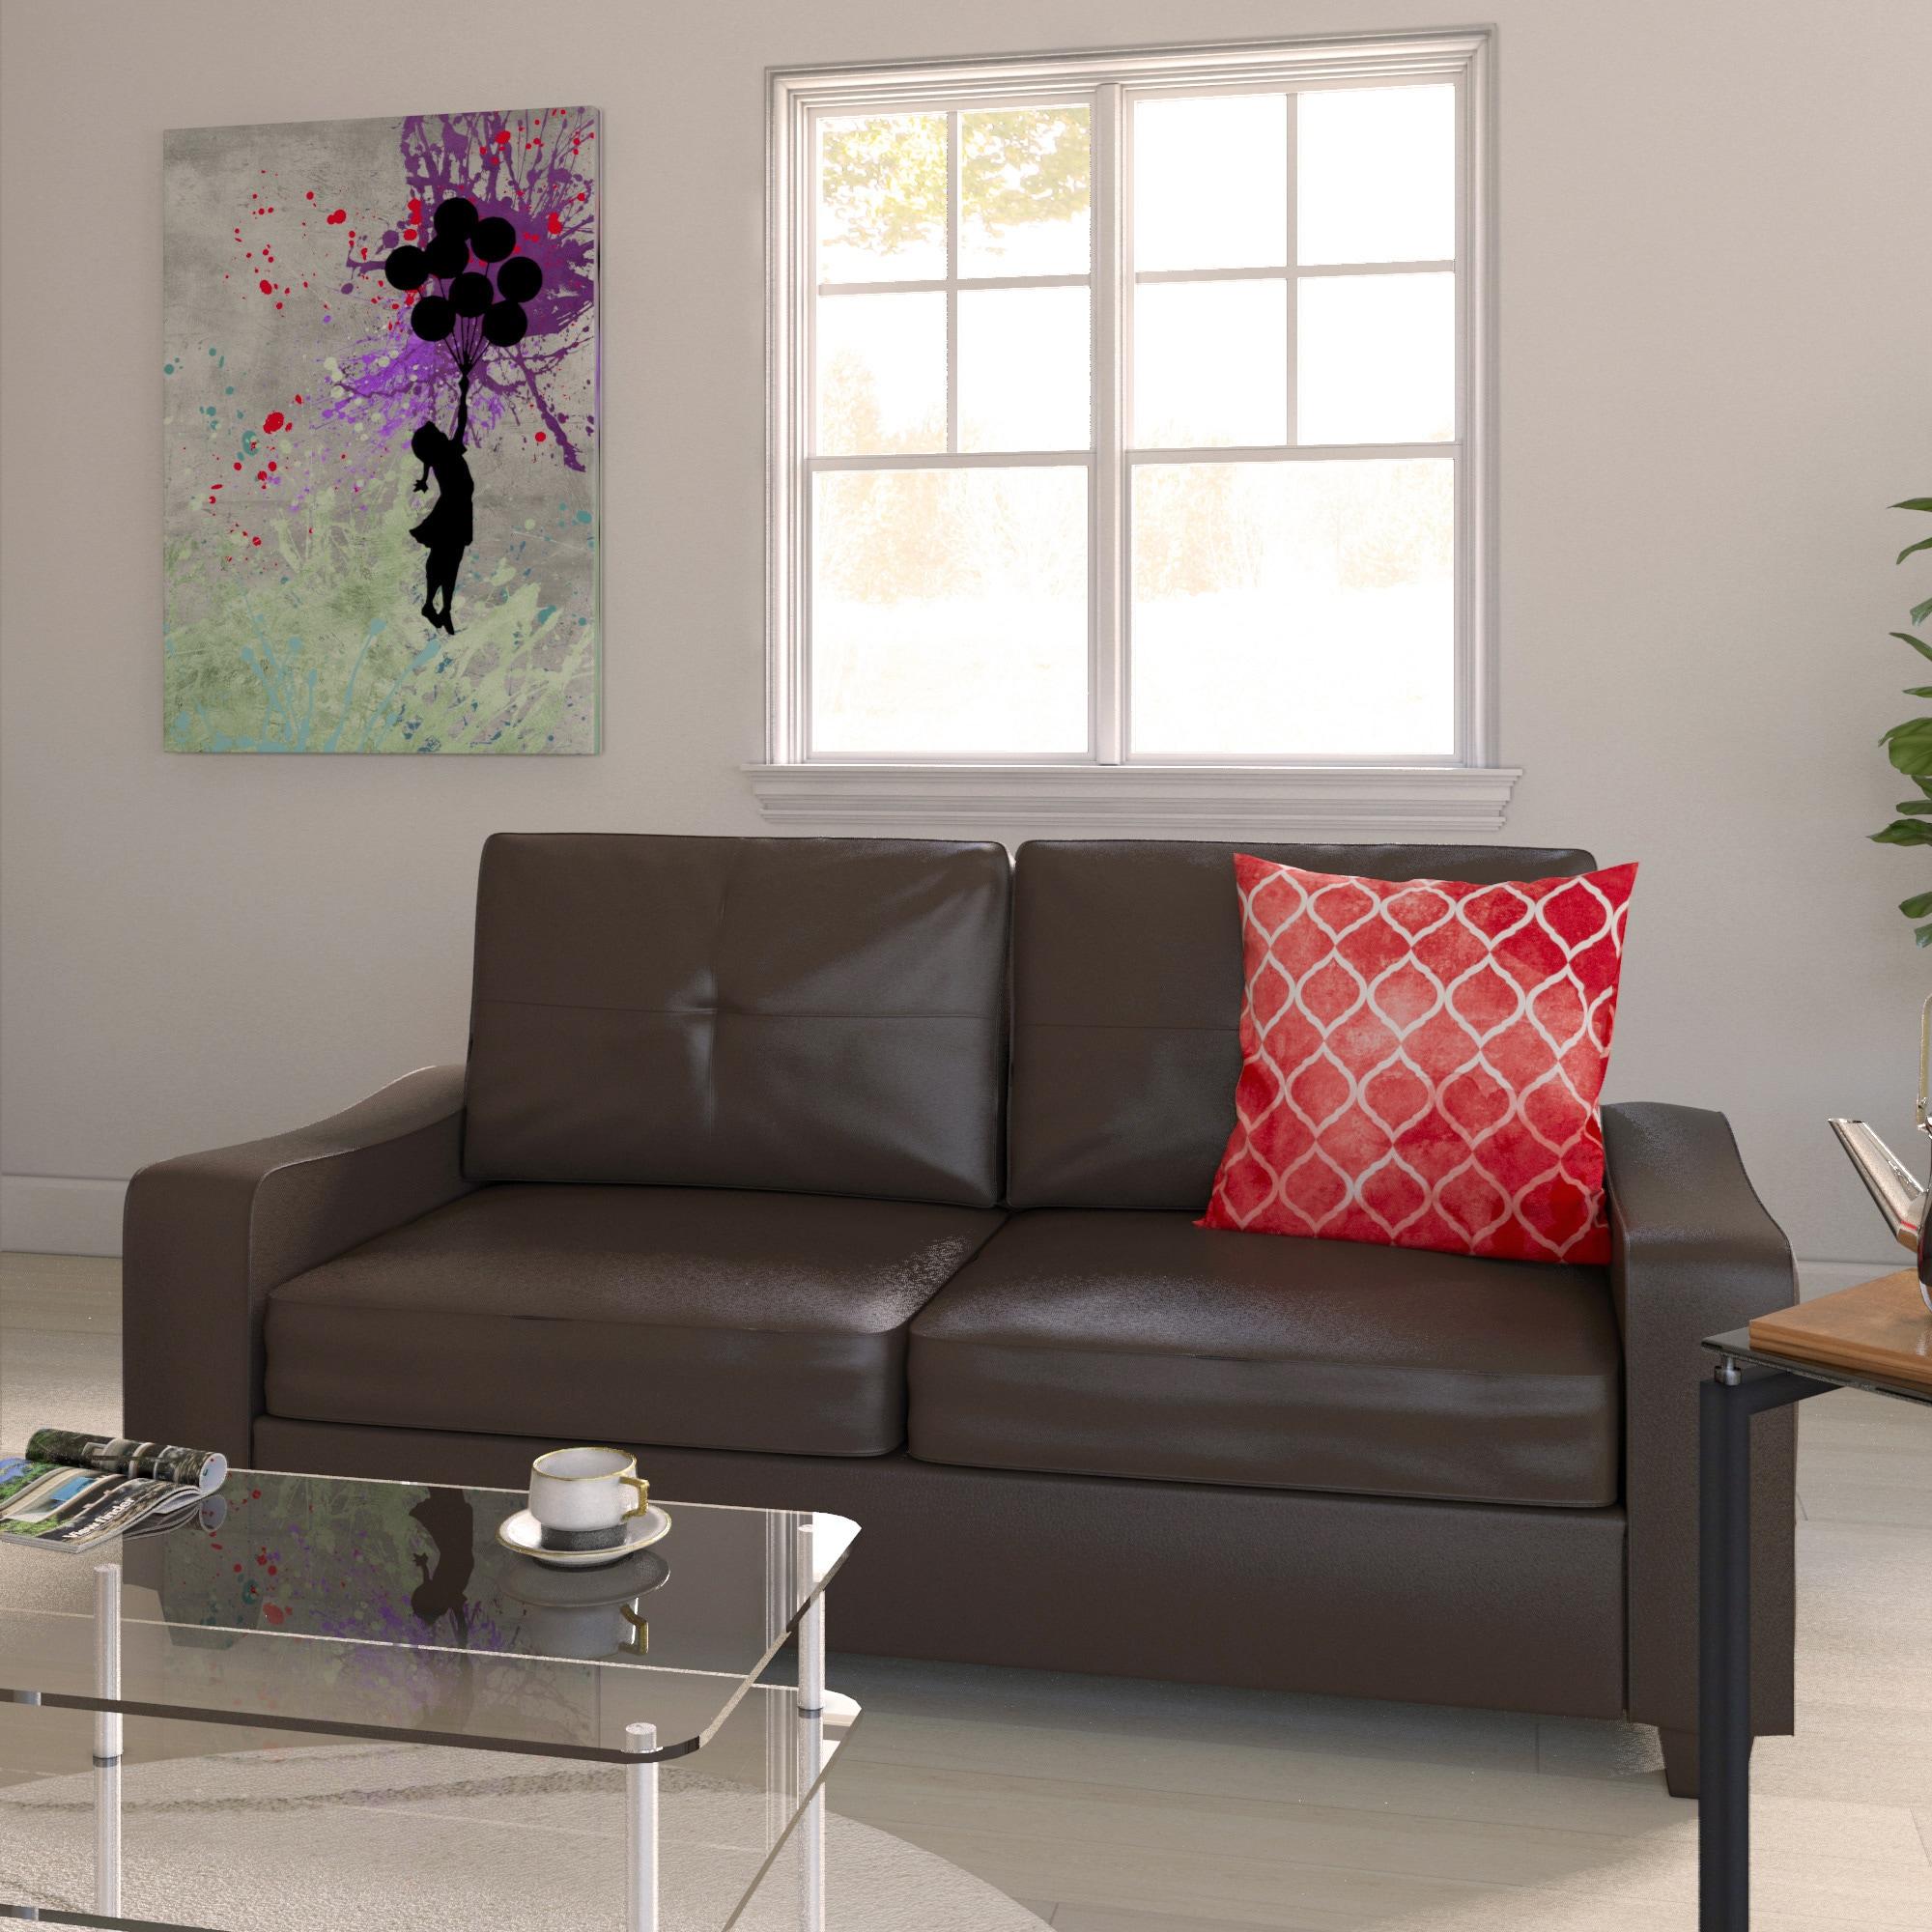 Ballard Dibble Brown Bonded Leather Plush Sofa Or Loveseat